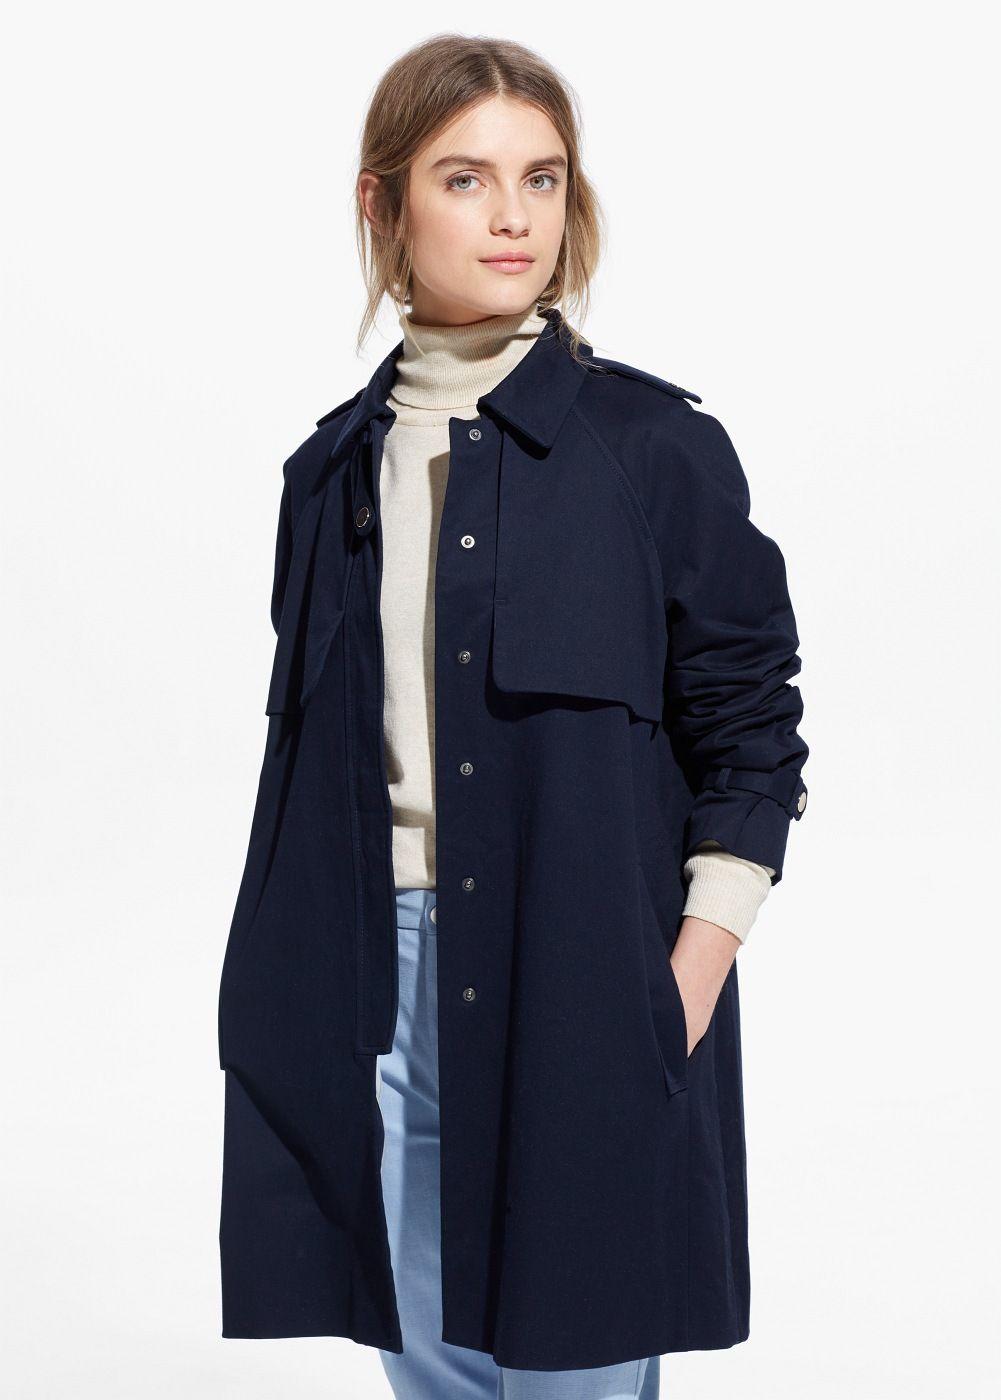 Impermeabil din bumbac - Femei   Inspiration   Pinterest   Coat ... e051c9fce18d